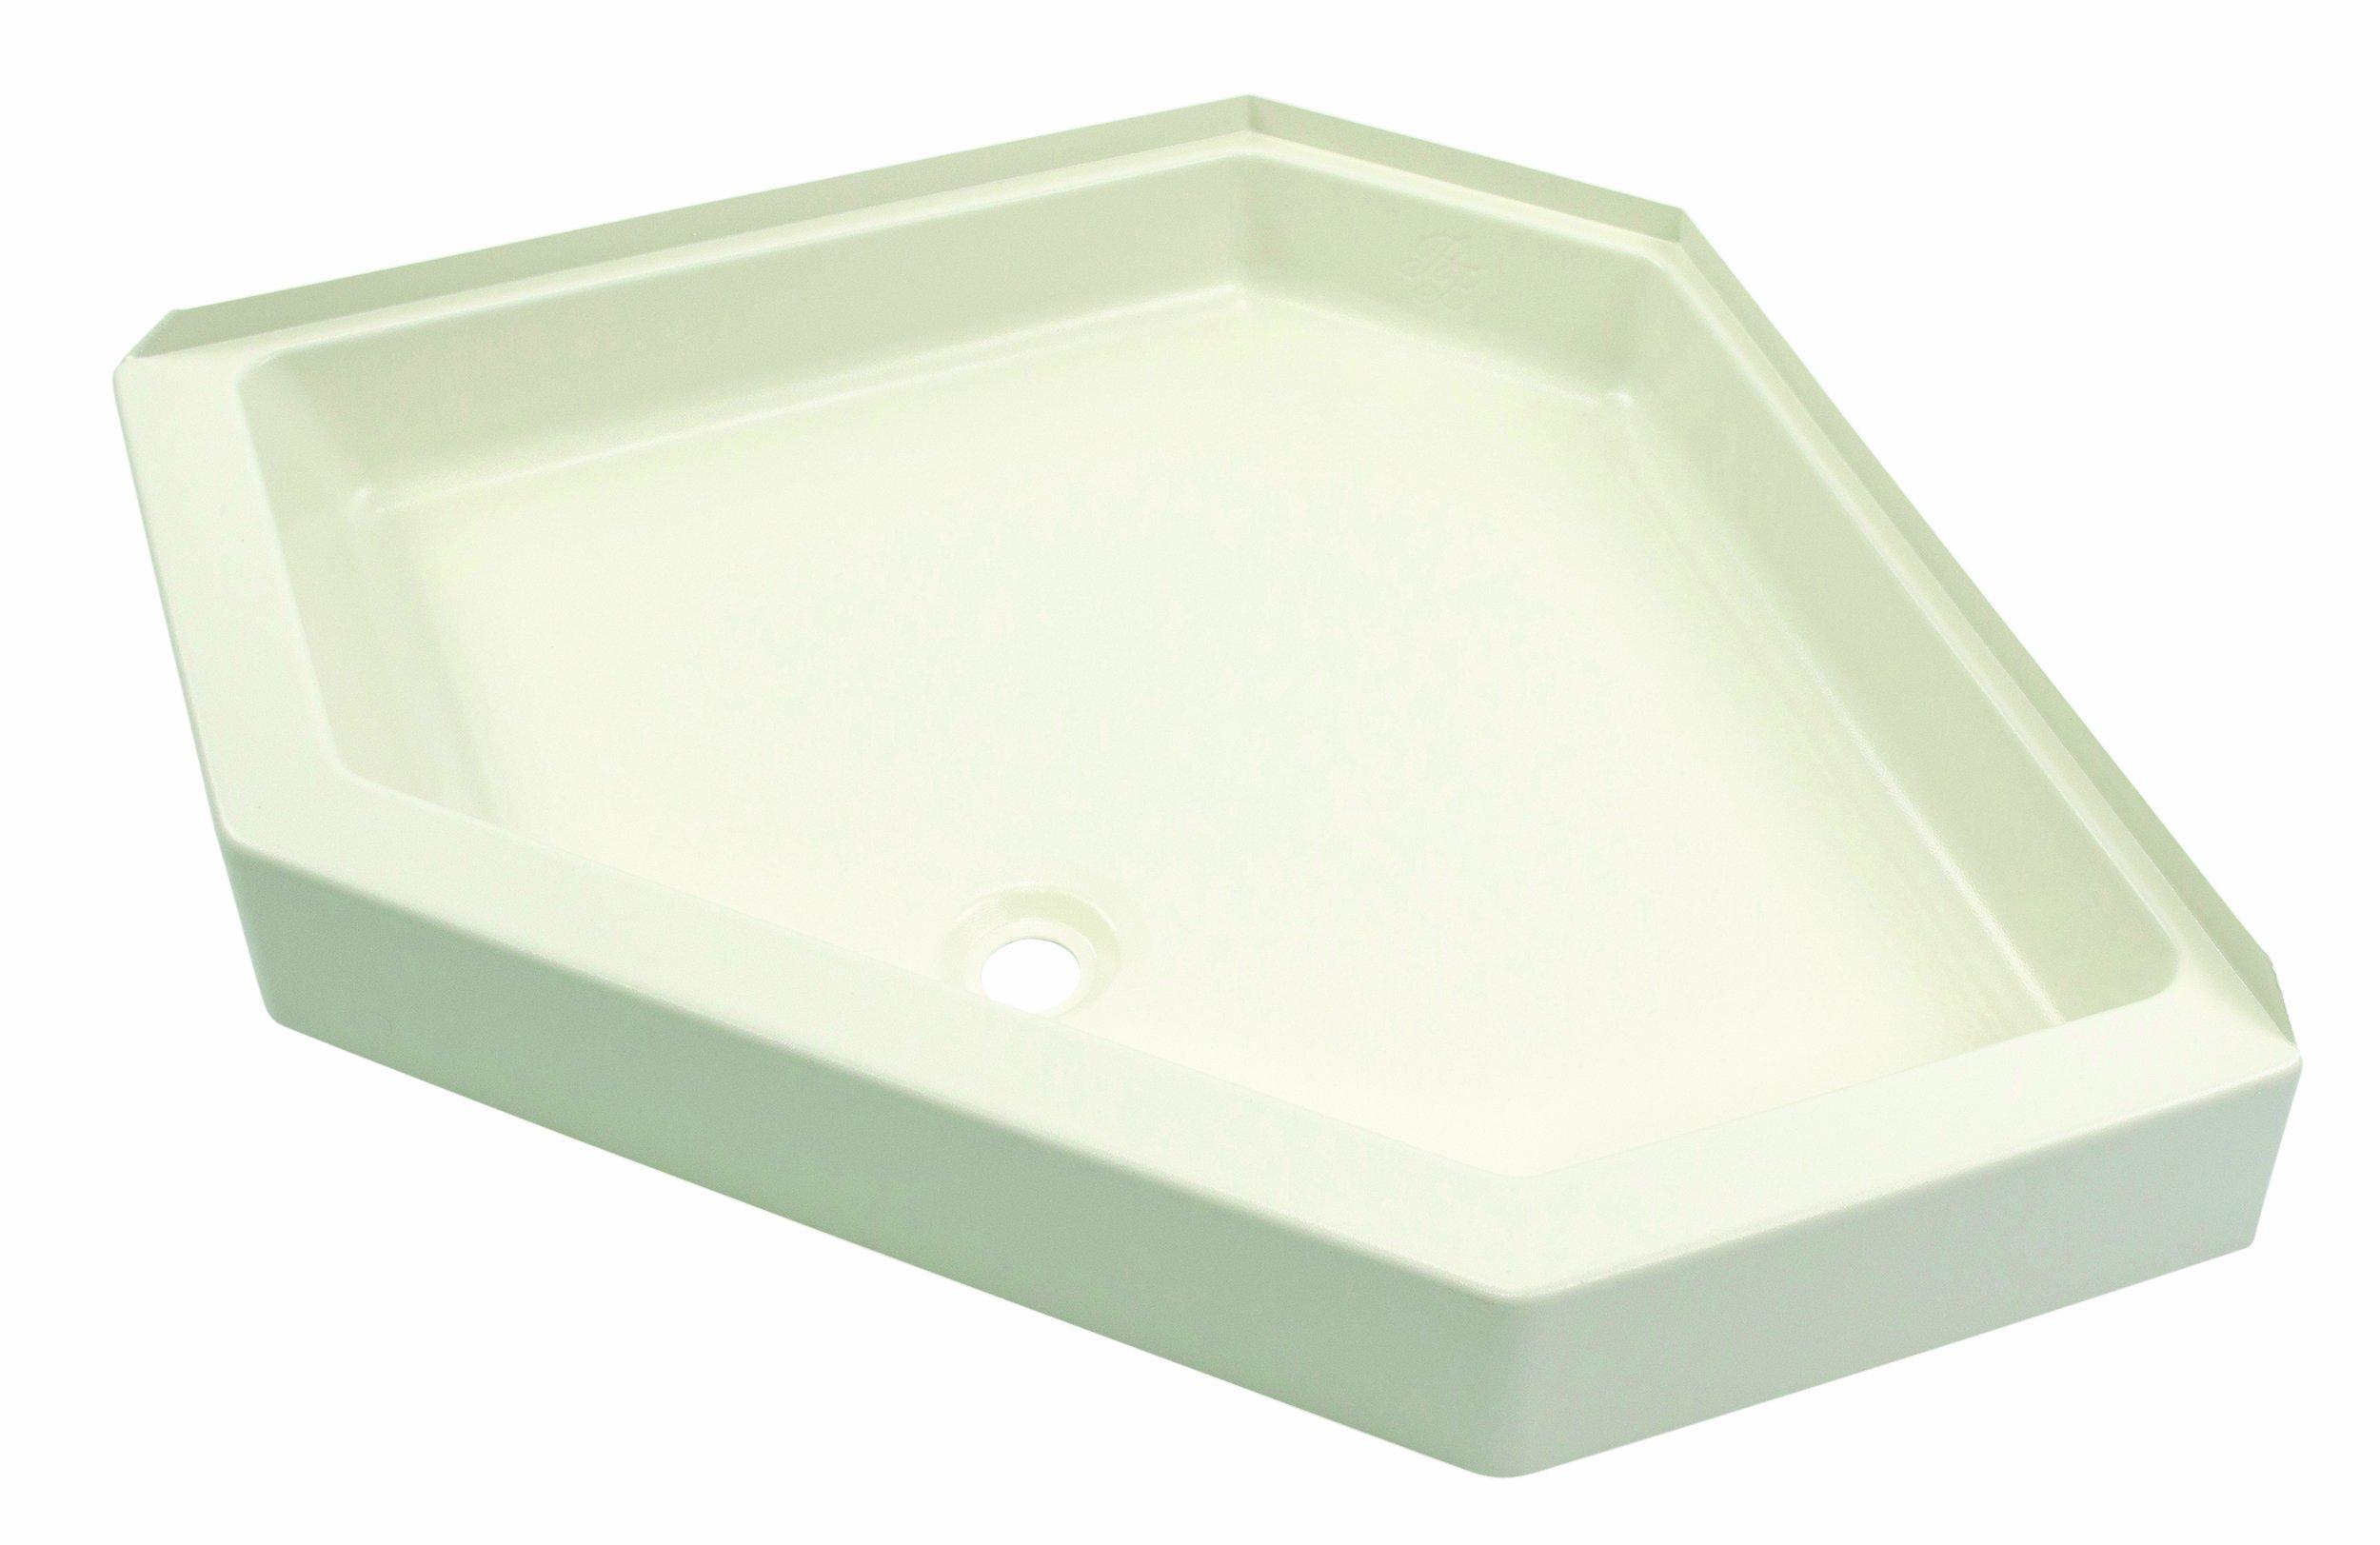 Lippert 301241 Better Bath 34'' x 34'' Neo Angle RV Shower Pan Center Drain Parchment